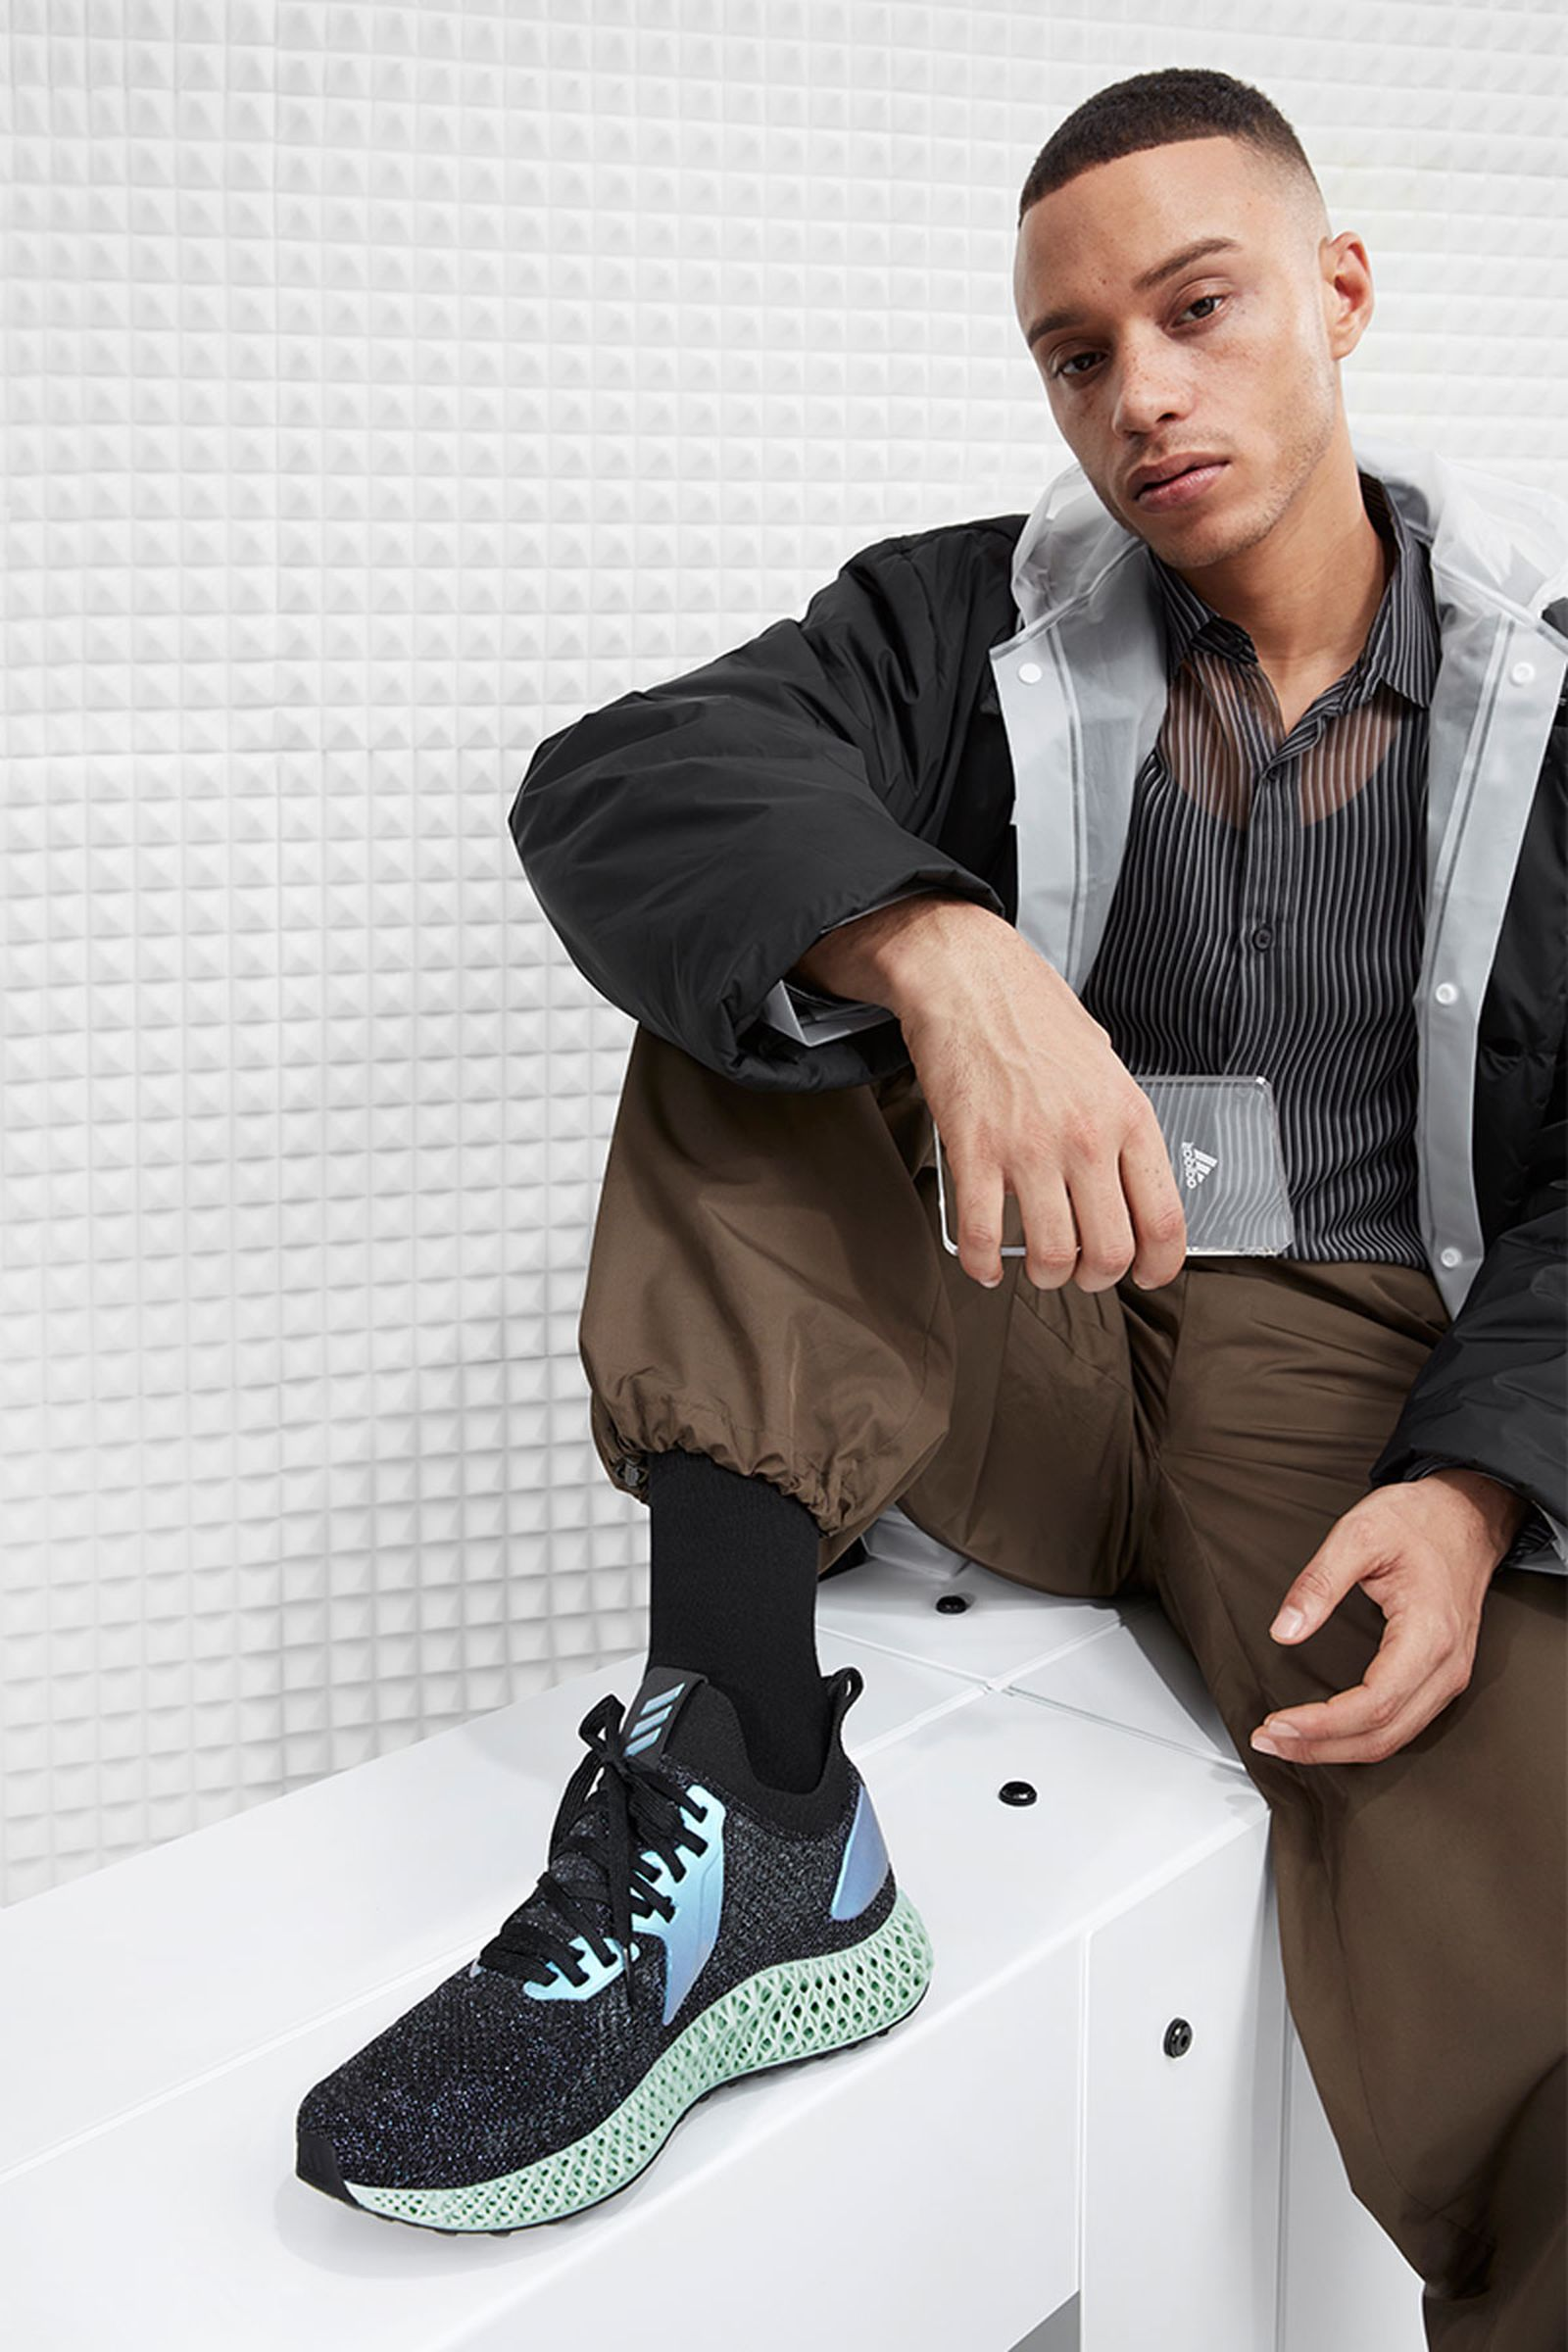 adidas-alphaedge-4d-goodbye-gravity-2